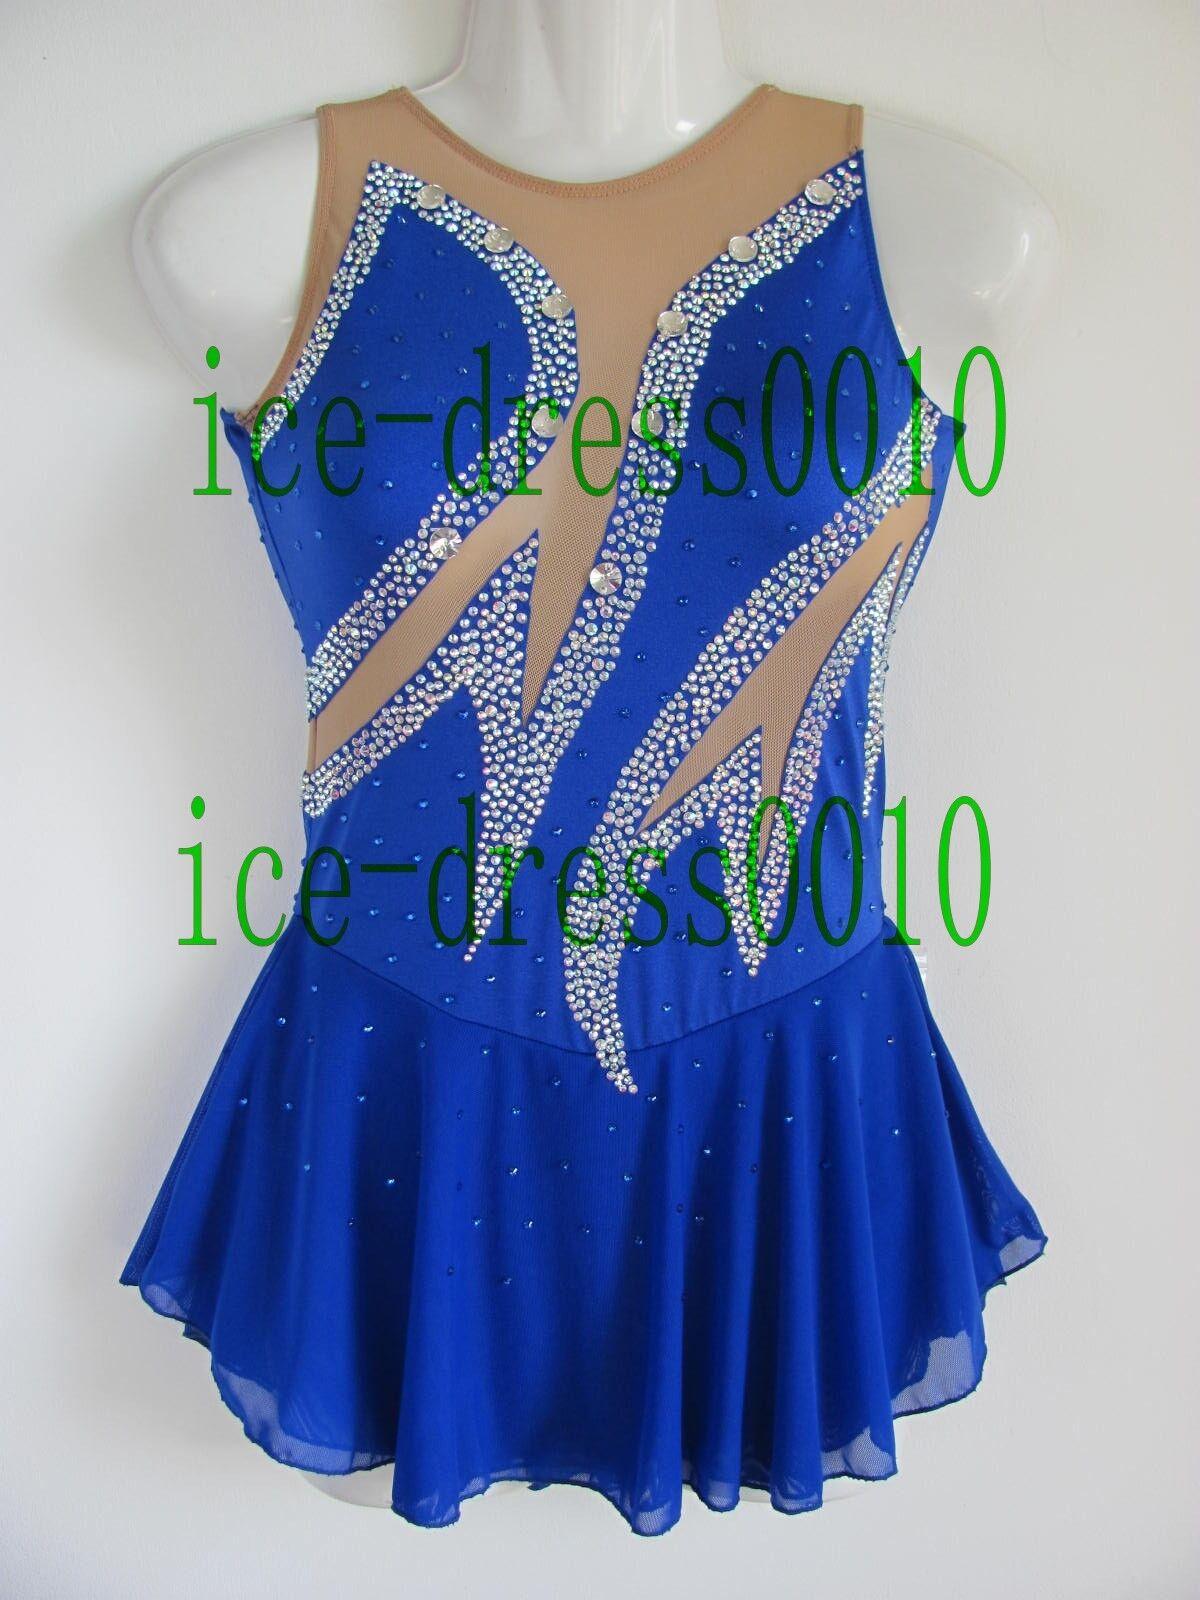 2018 new style Figure Skating Ice Skating Dress Gymnastics Costume 113-1